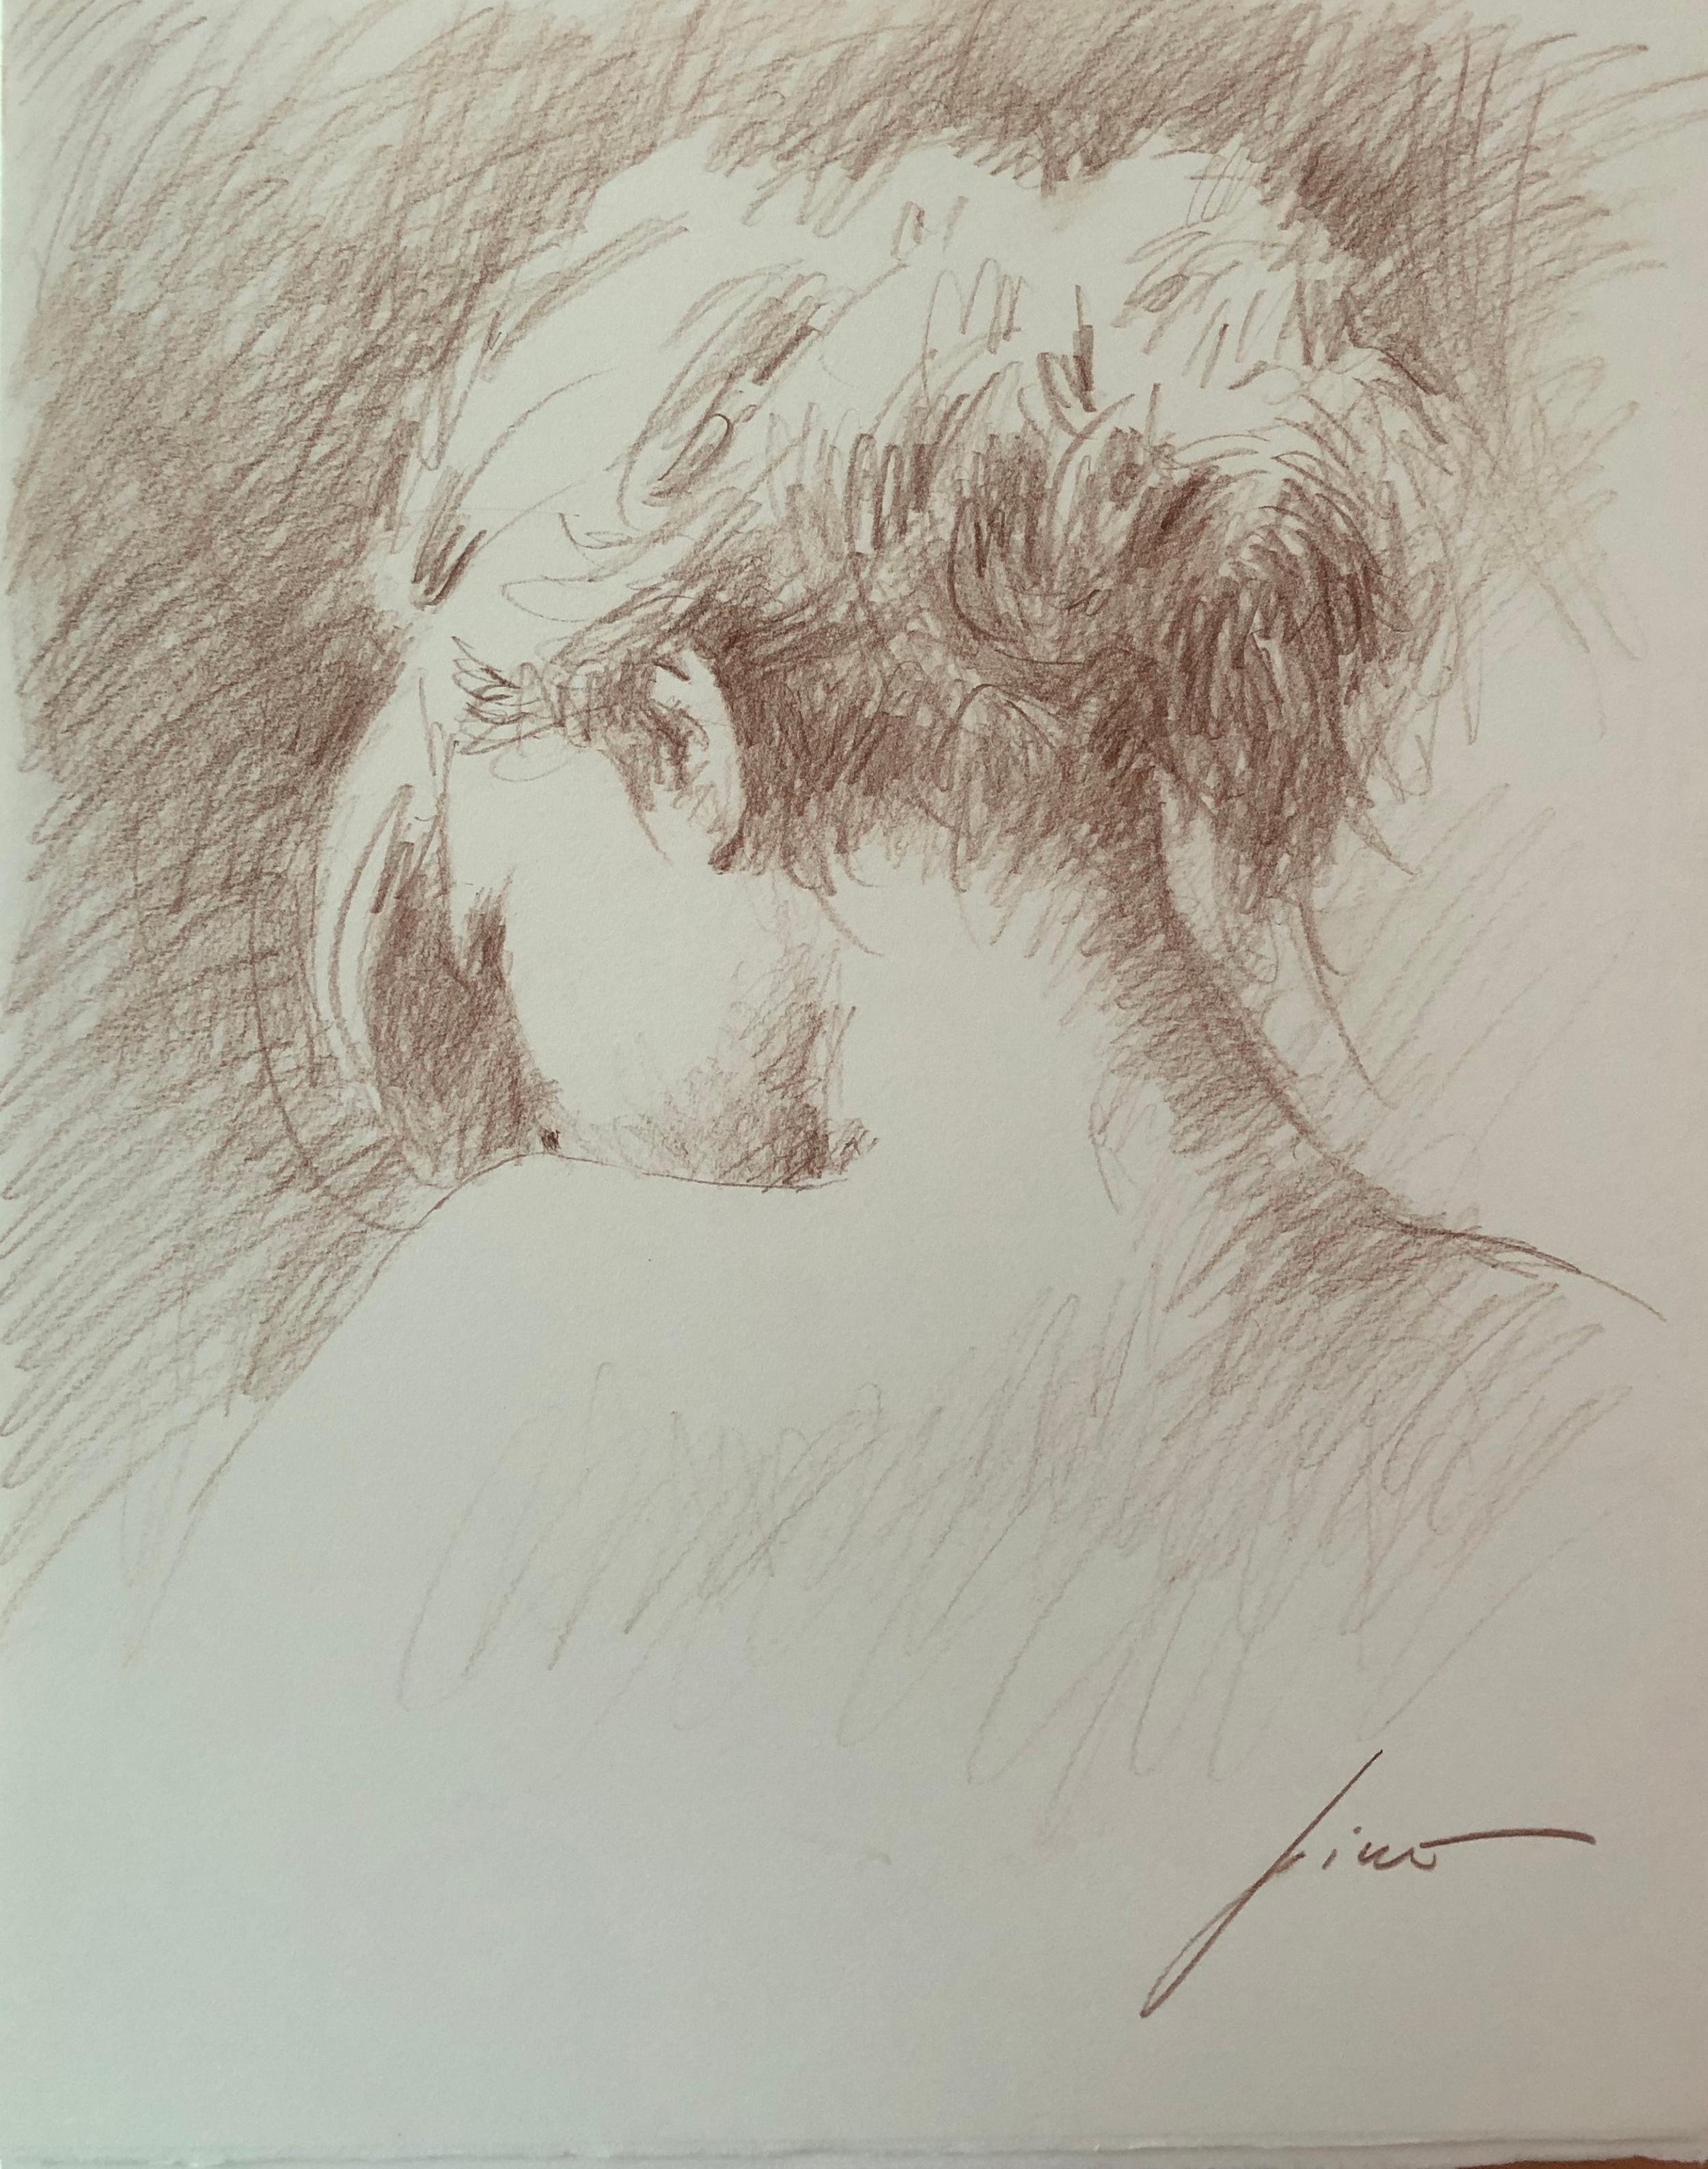 Pino Original Drawing